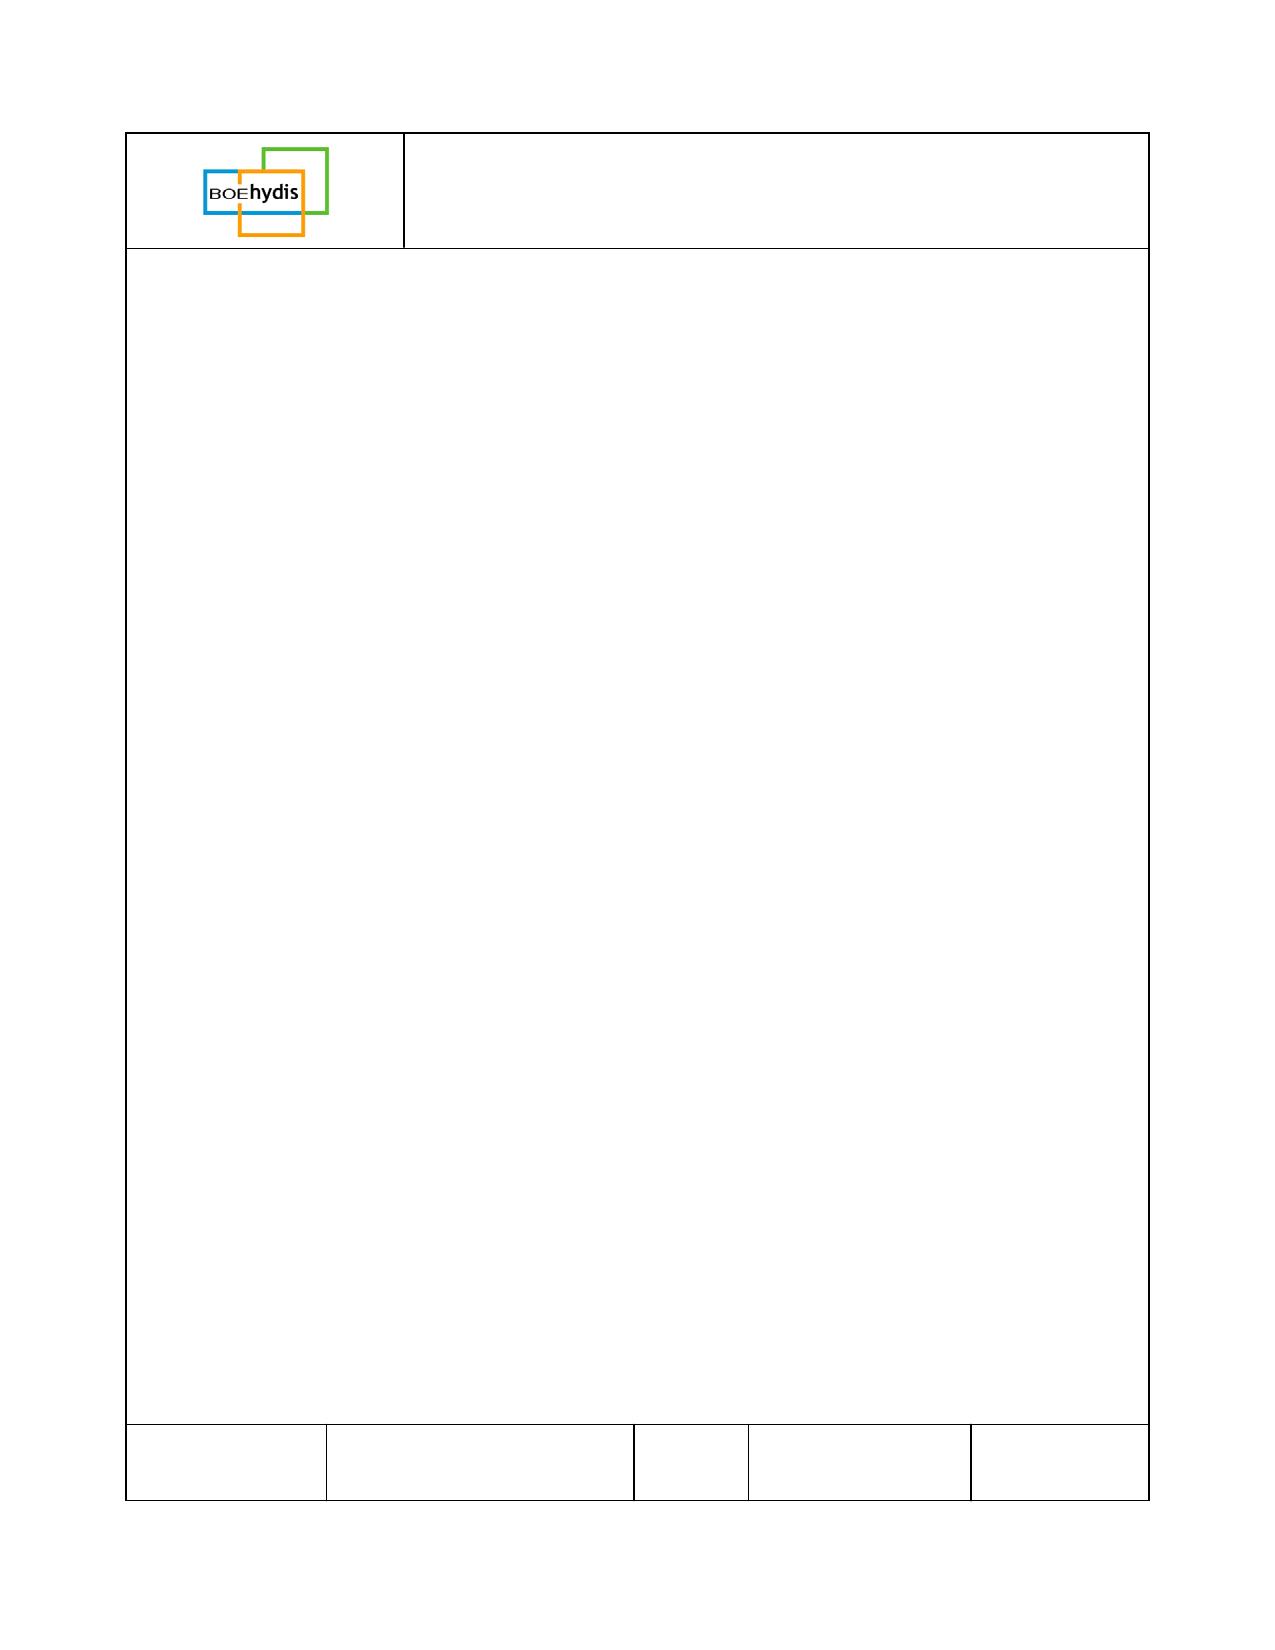 HV121WX5-113 Datasheet, HV121WX5-113 PDF,ピン配置, 機能